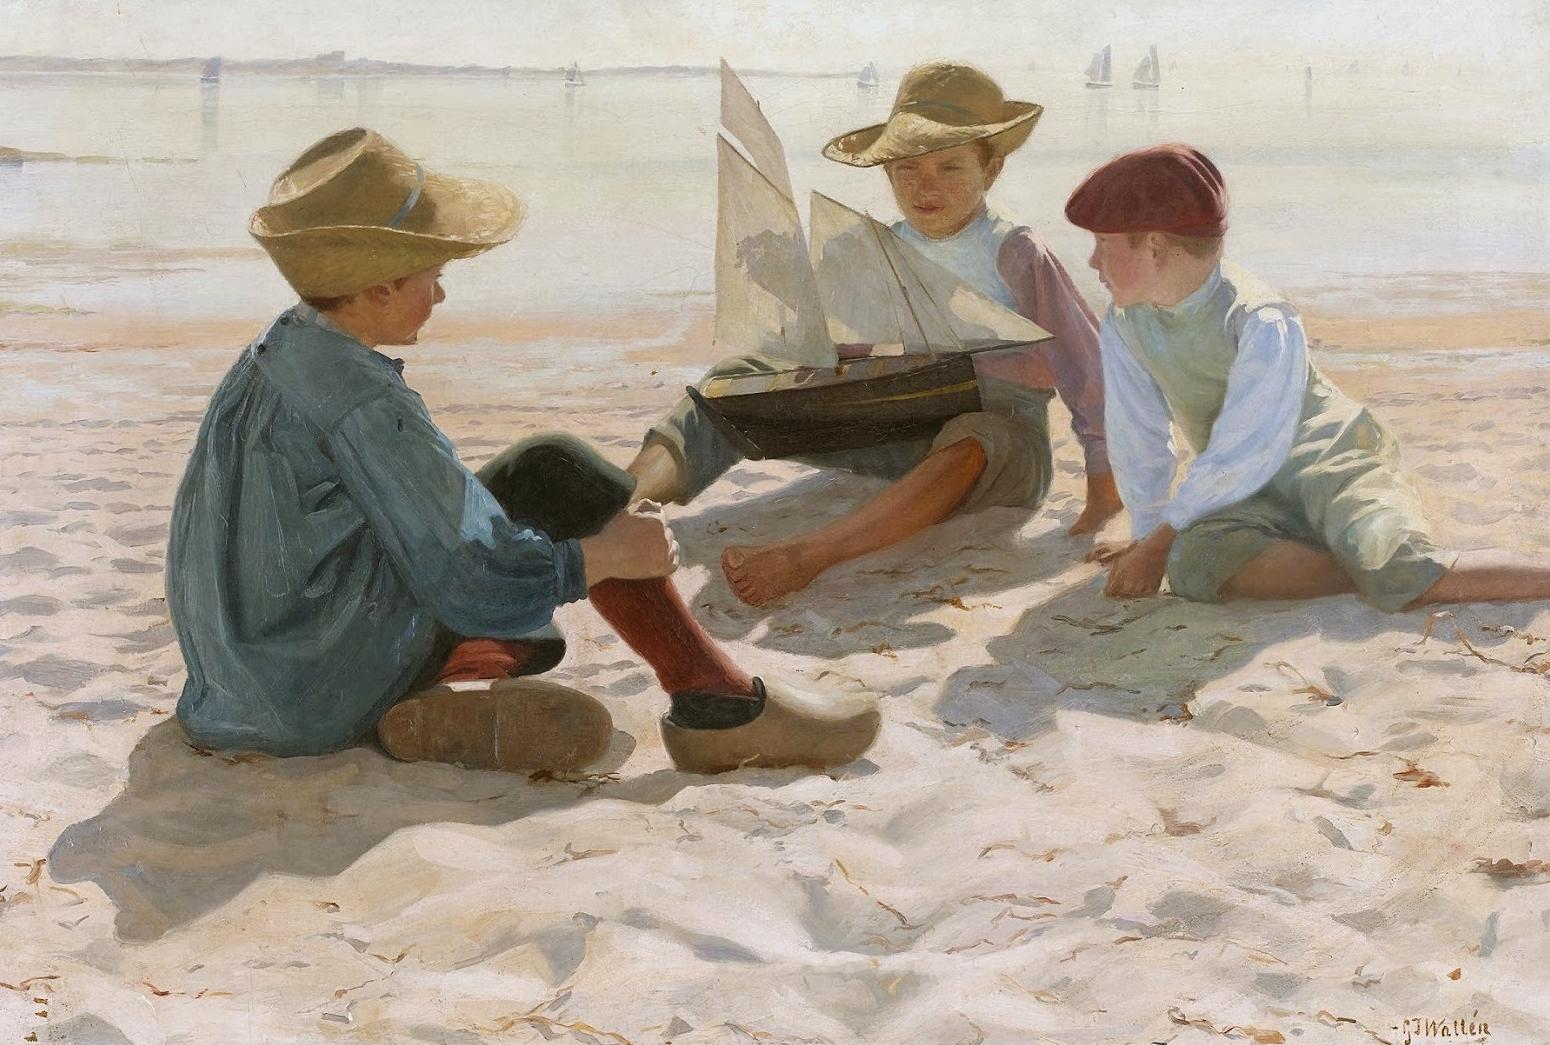 Gustaf Theodor Wallén (1860-1948) - Boys in the Sunlight